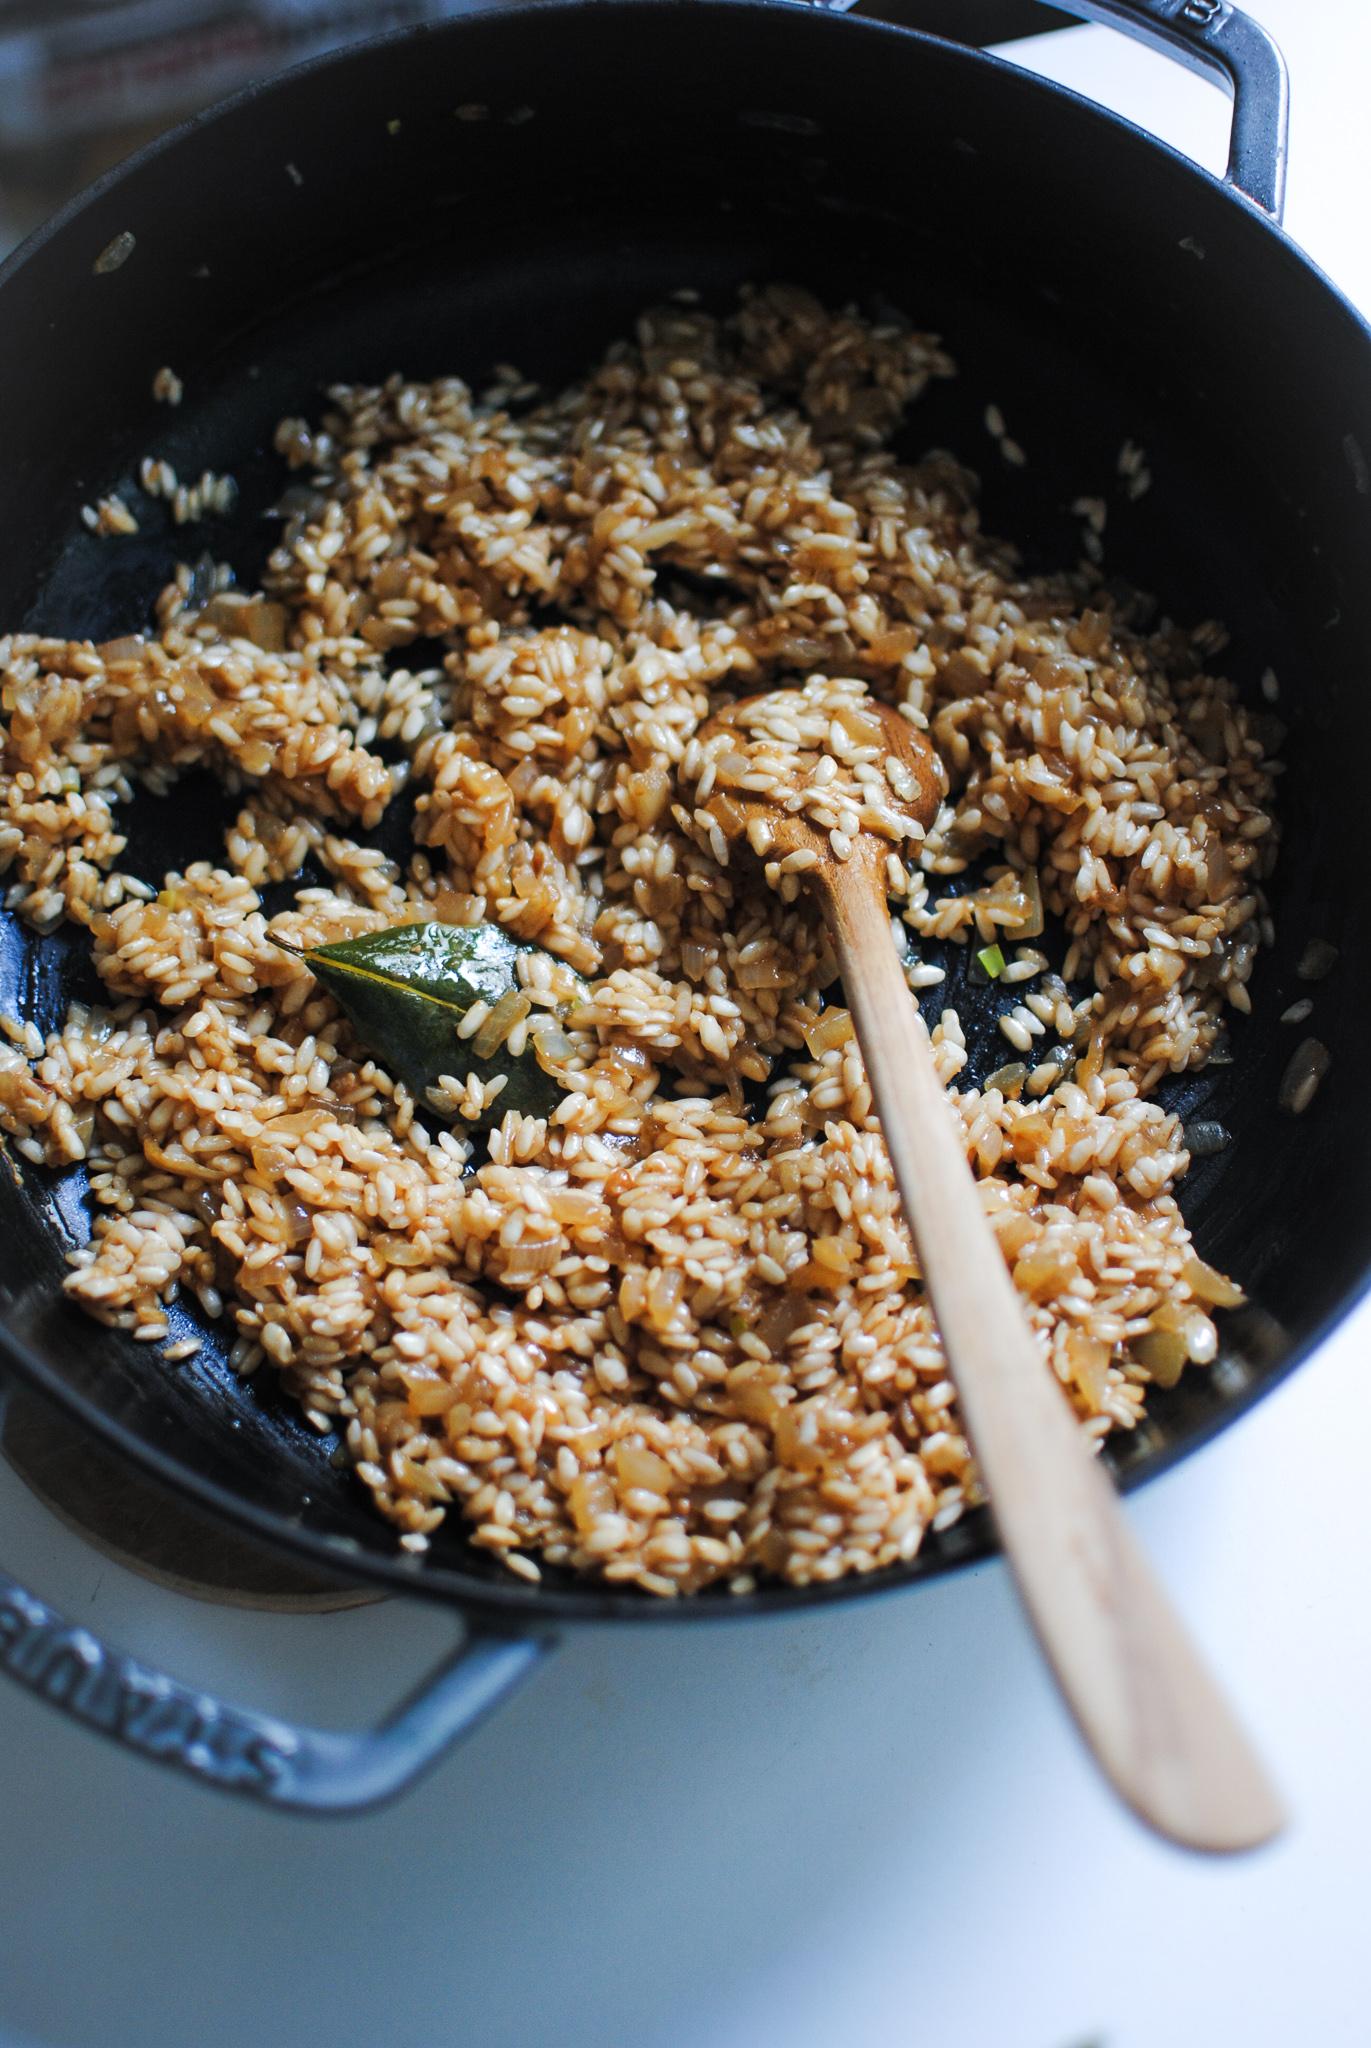 risotto vegan de abobora com parmesao vegan | please consider | joana limao